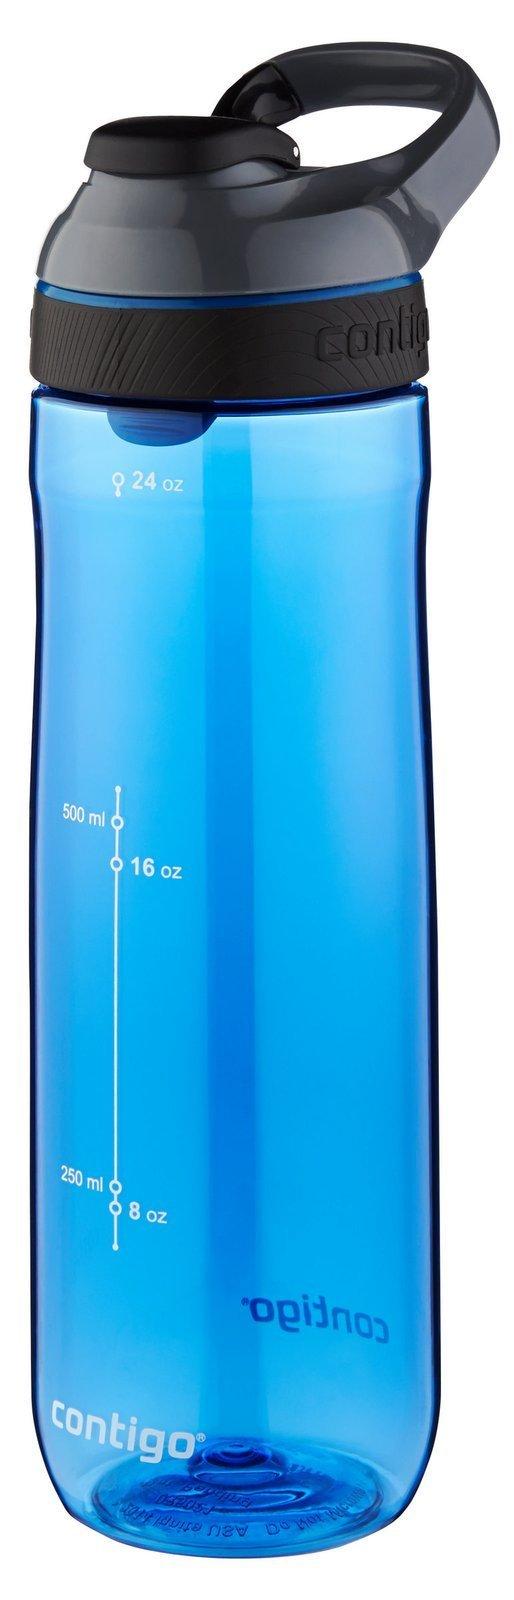 Butelka do wody Contigo Cortland niebieska 720 ml